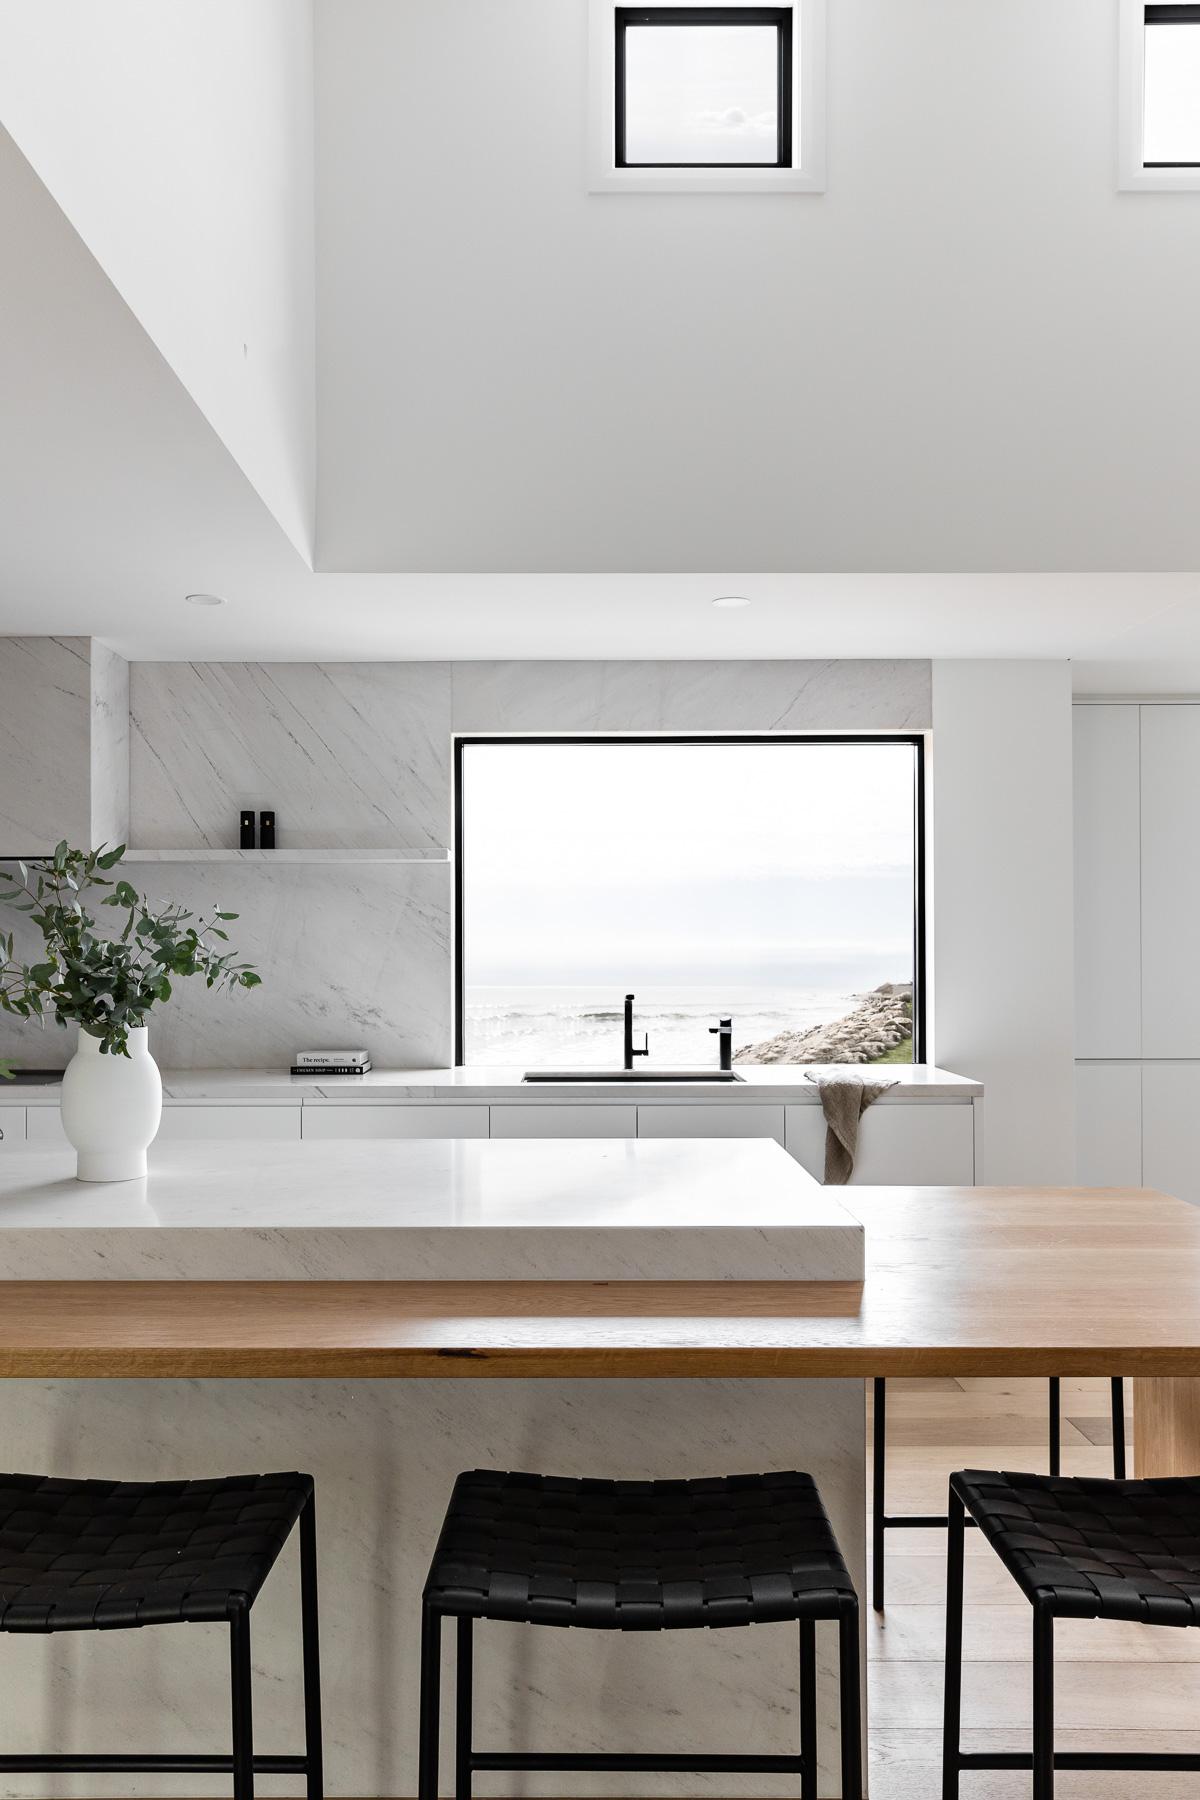 tameka-moffat-design-modern-kitchen-coastal-window-view